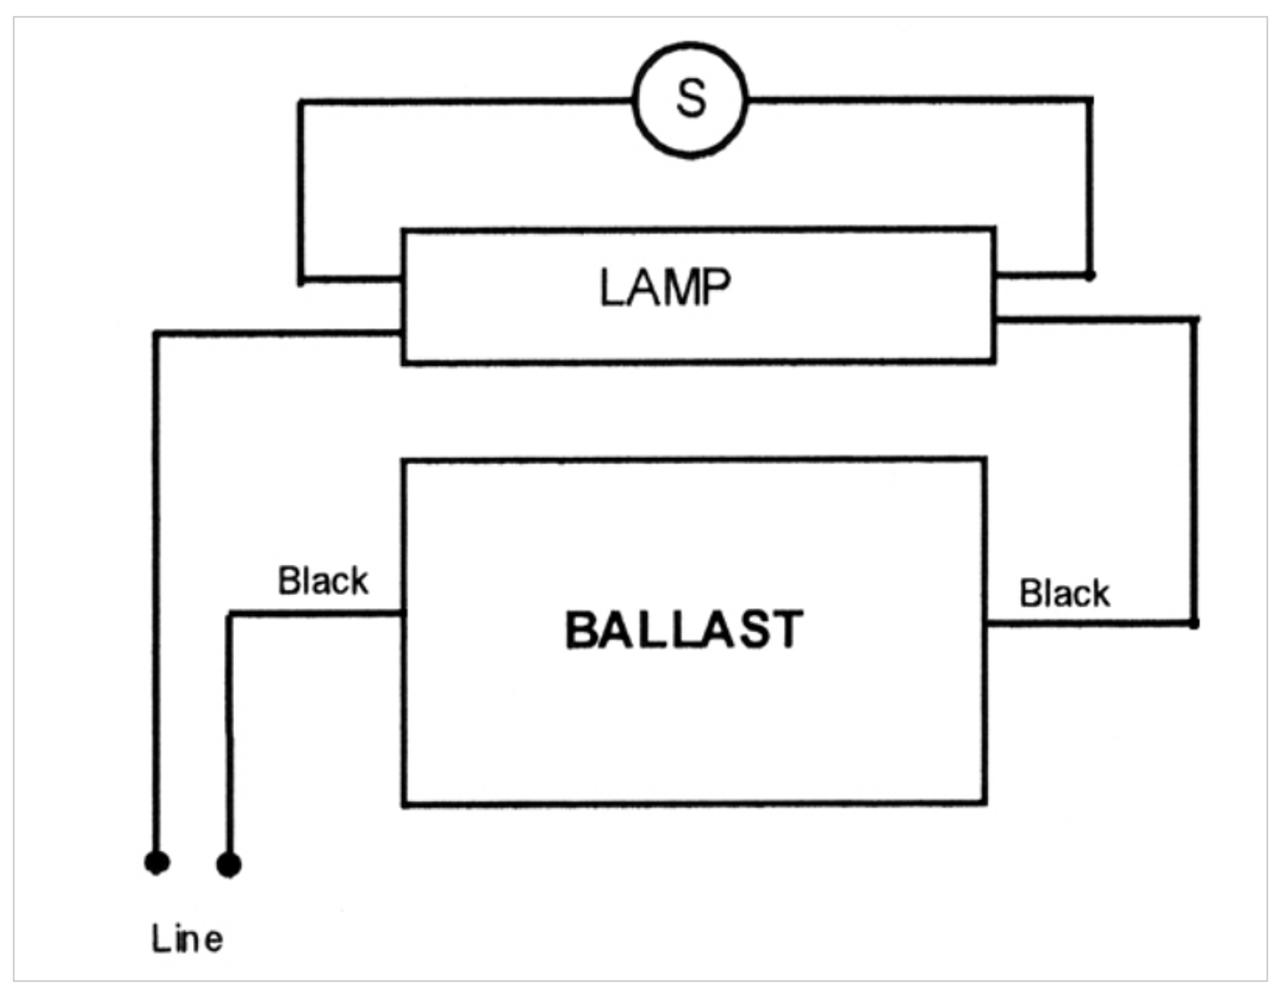 small resolution of robertson ballast wiring diagram wiring diagrams lolsp48 robertson magnetic ballast f4t5 f6t5 f8t5 lamps